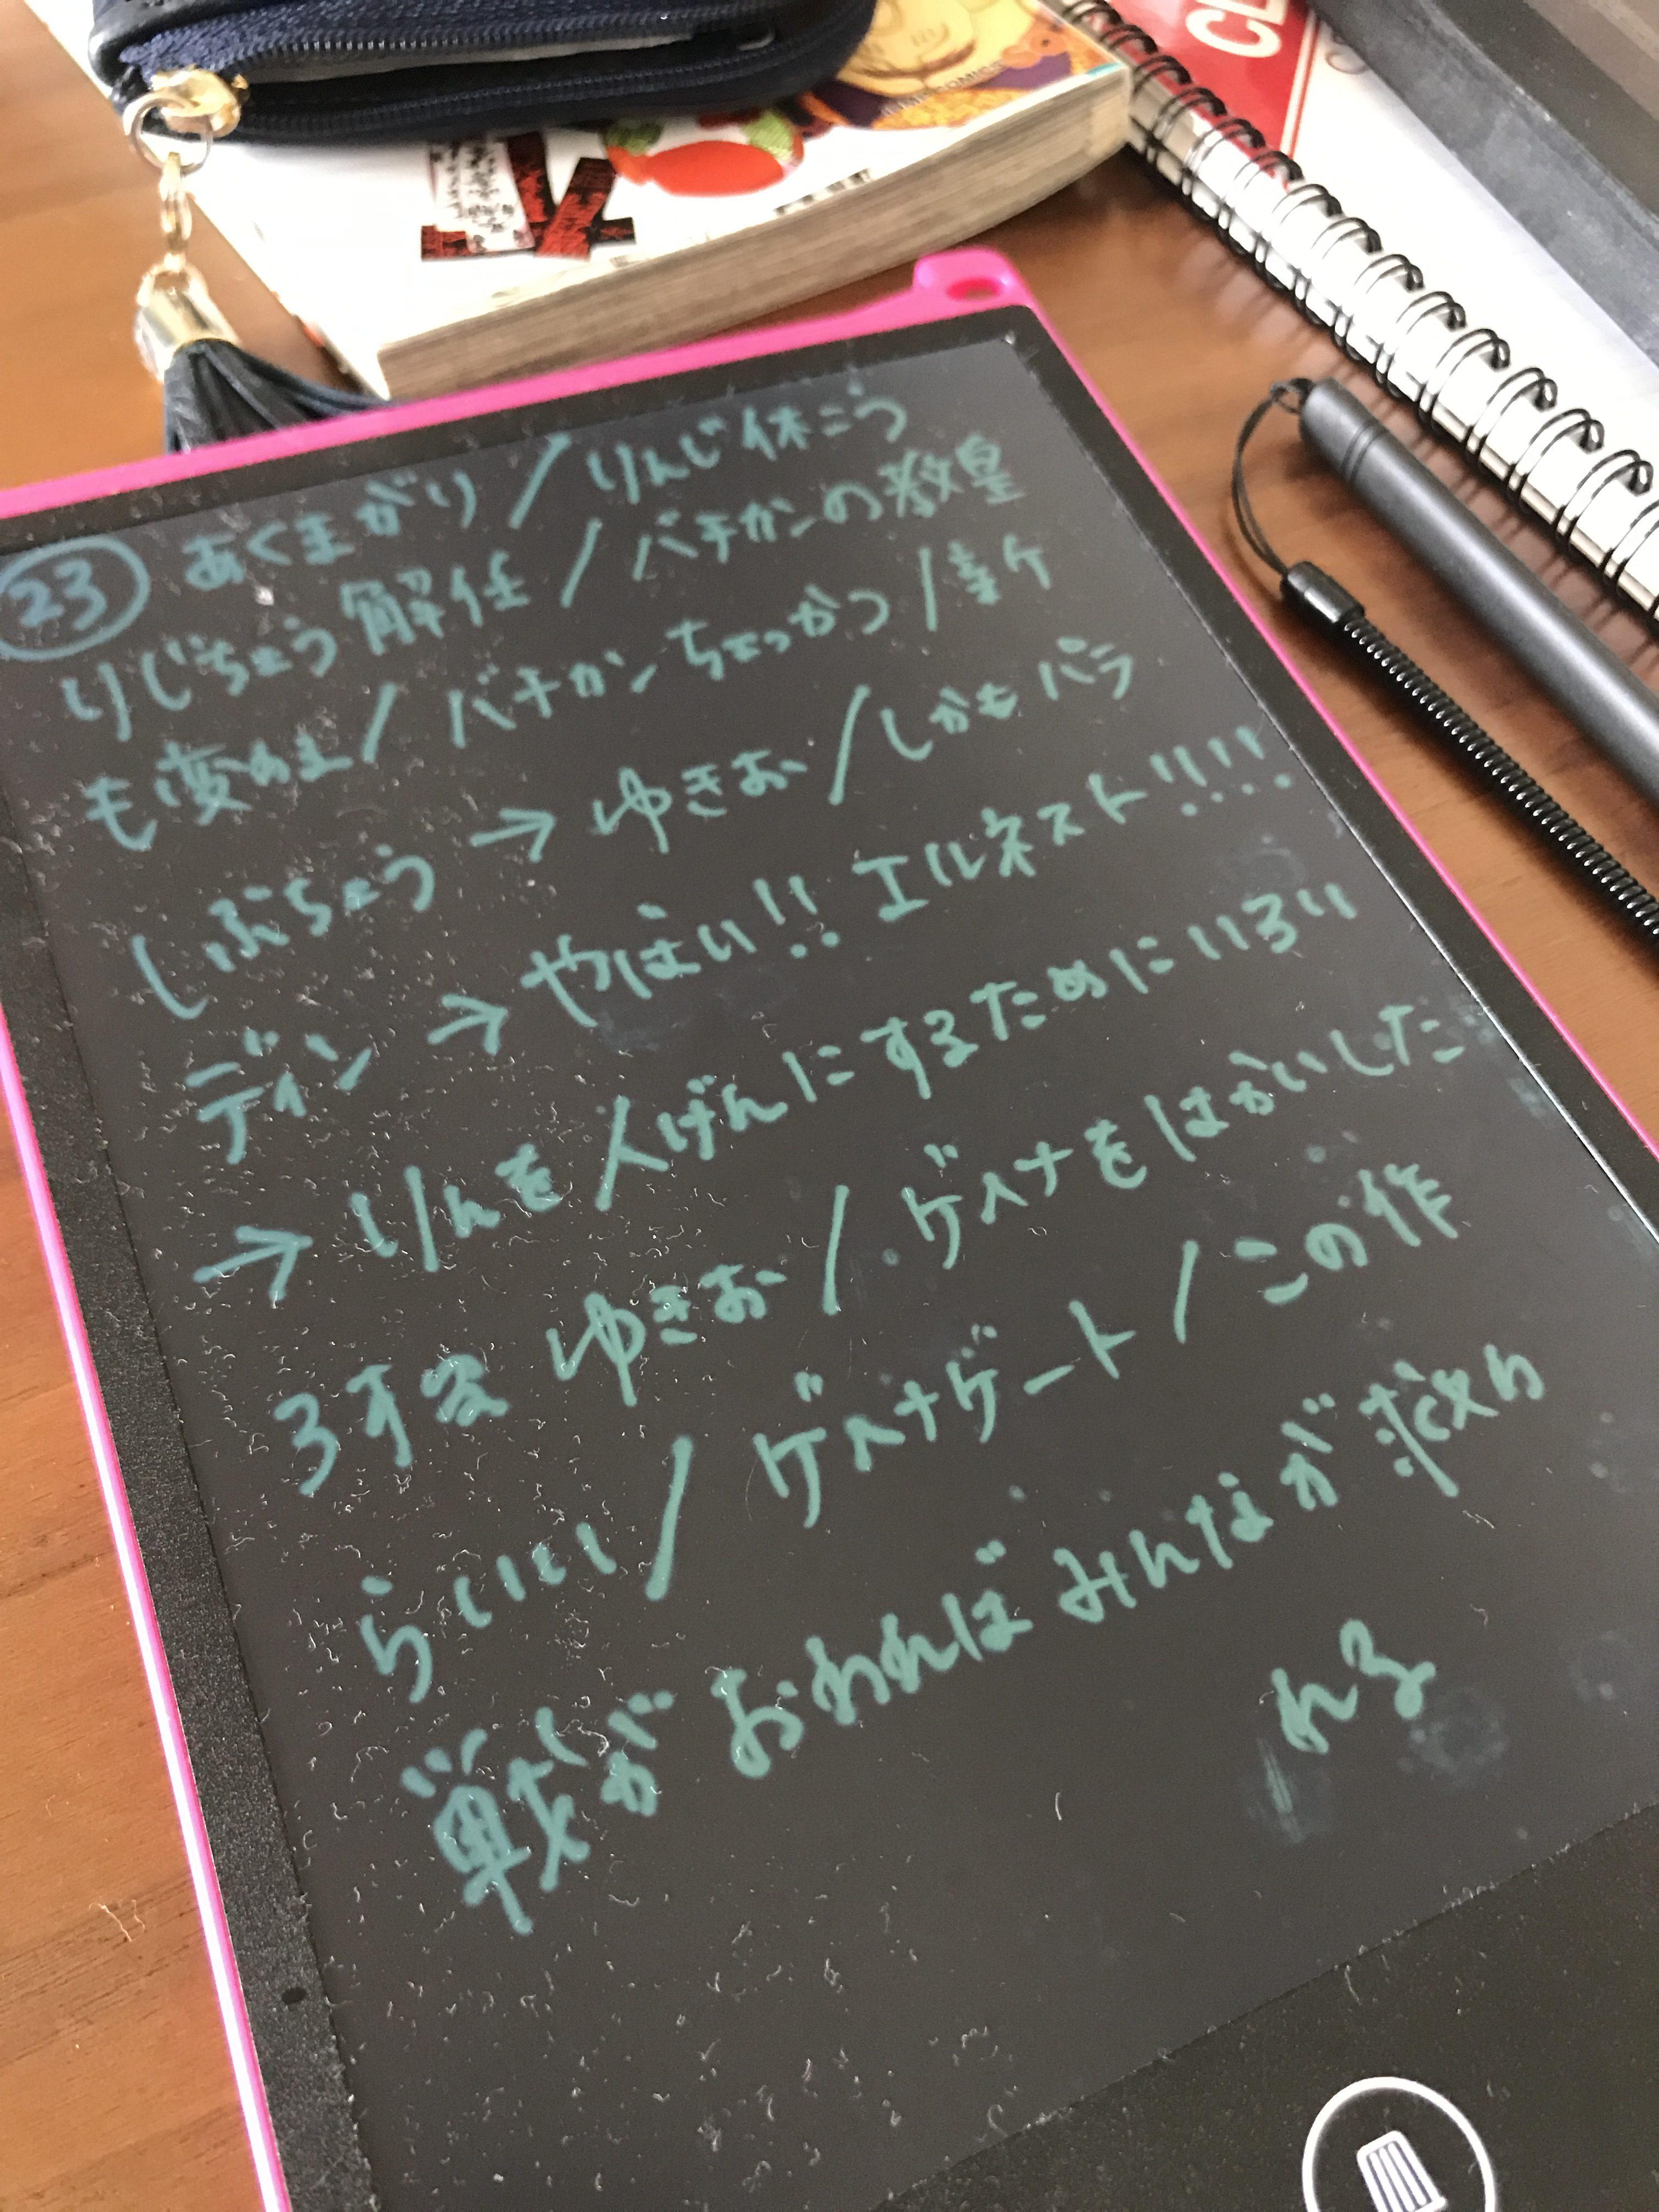 HOMESTEC 電子パッド 電子メモ帳